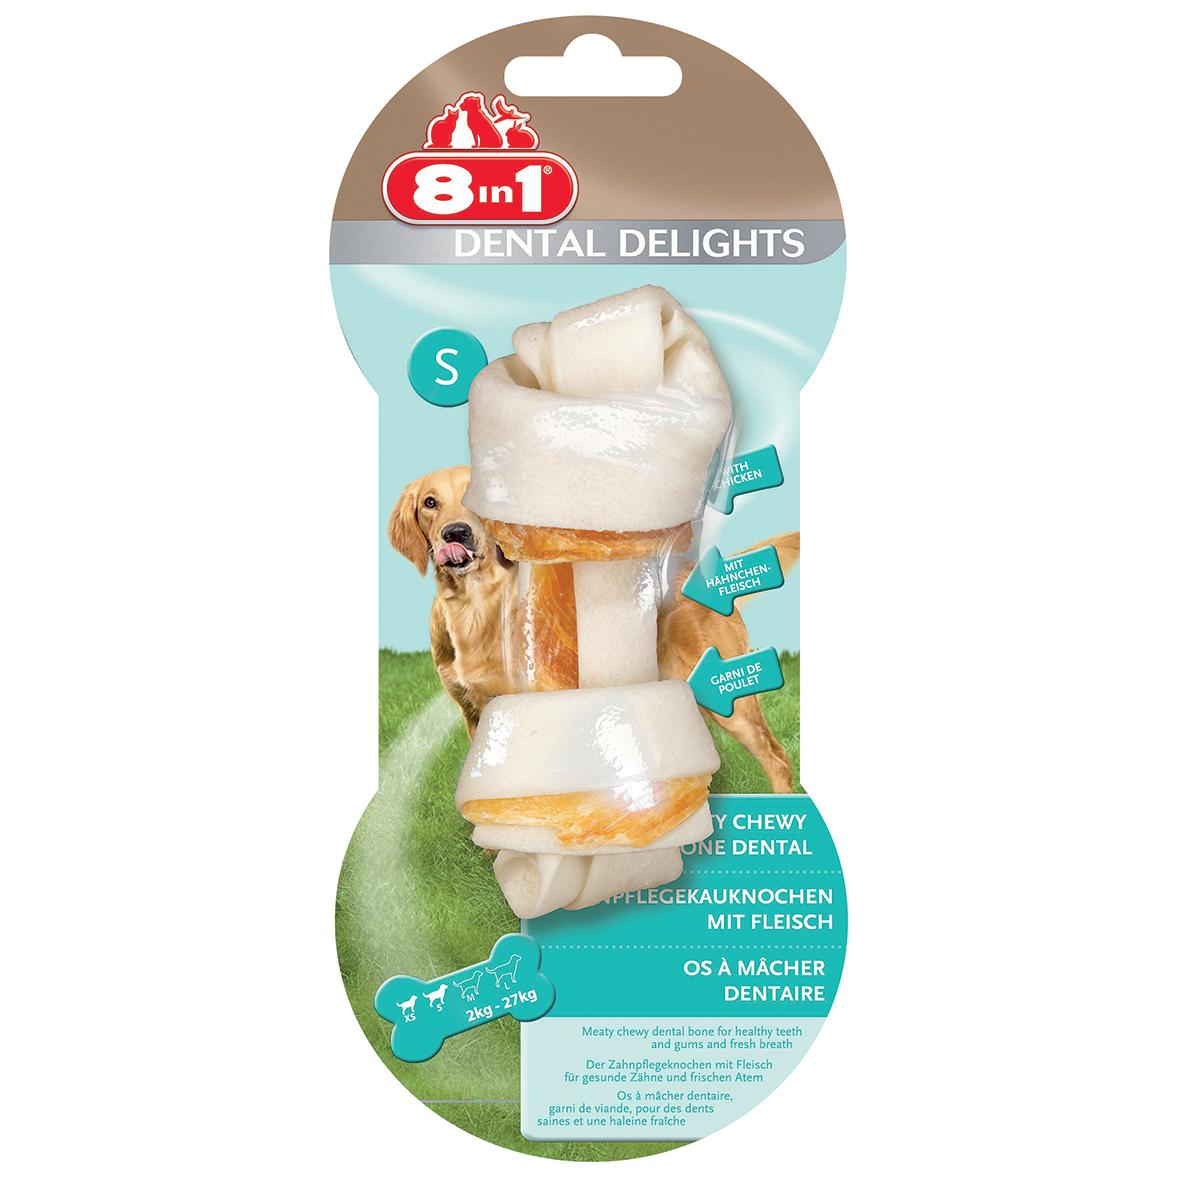 8 in 1 Oase Dental Delights S imagine